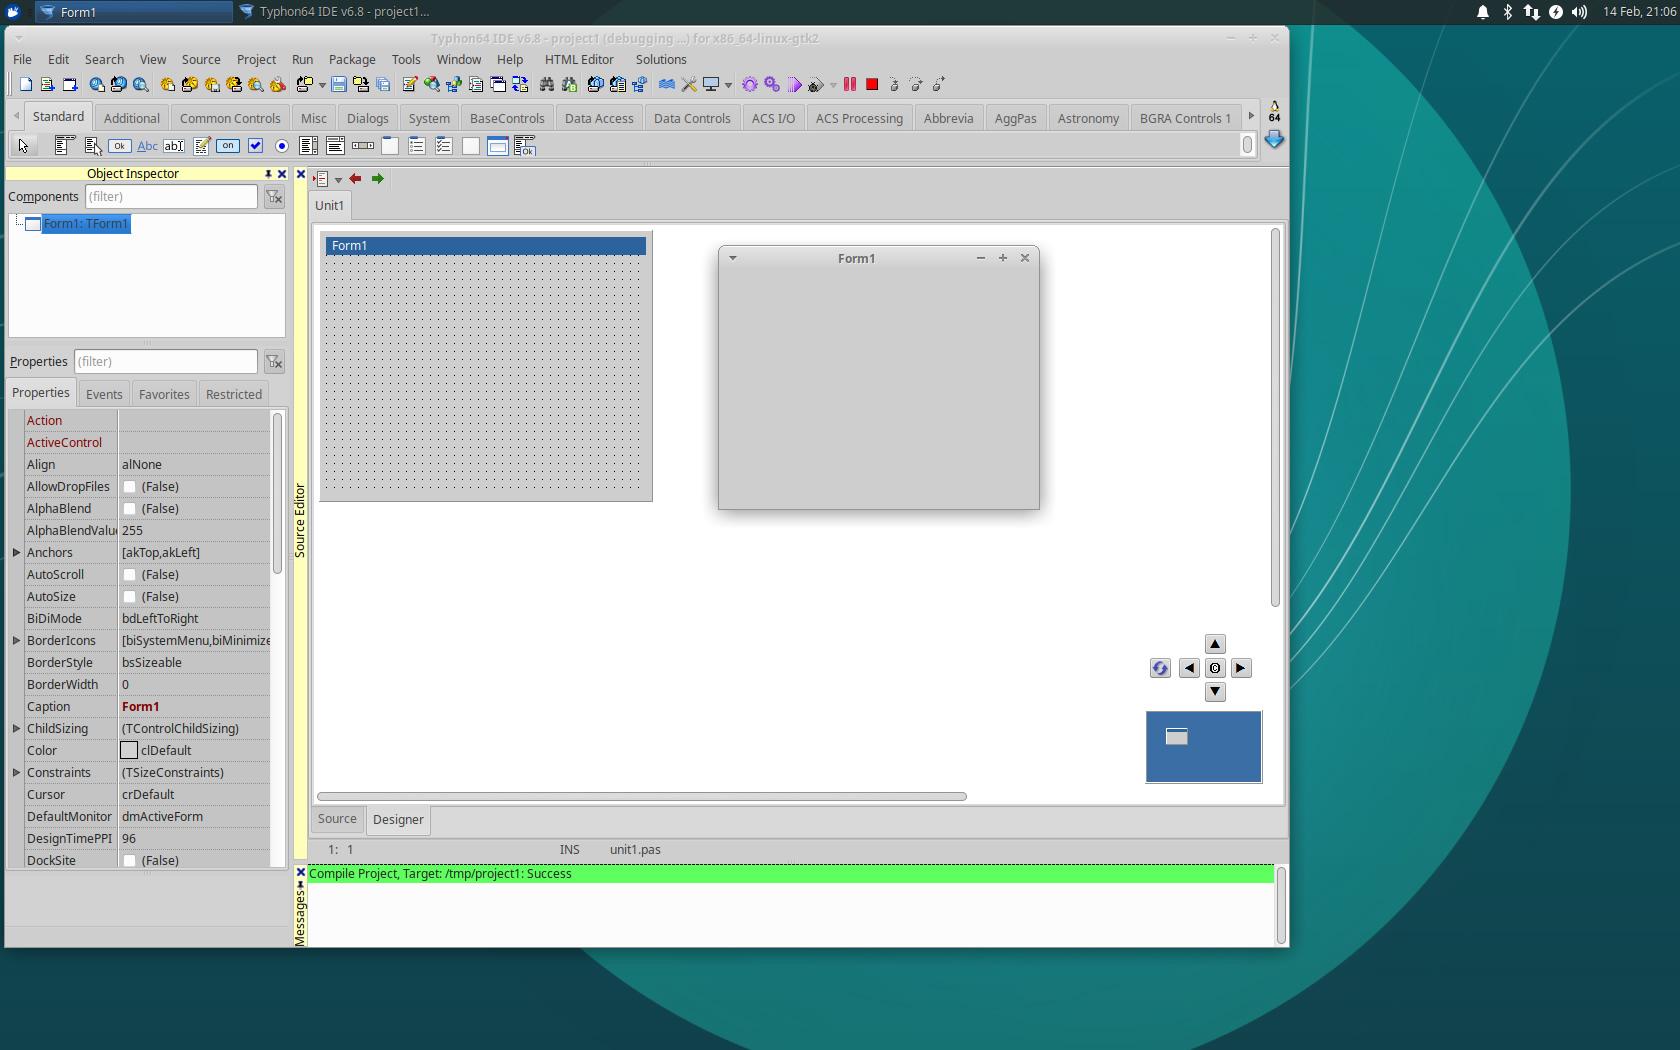 Xubuntu64-1804-2019-02-14-2_2019-02-14.jpg